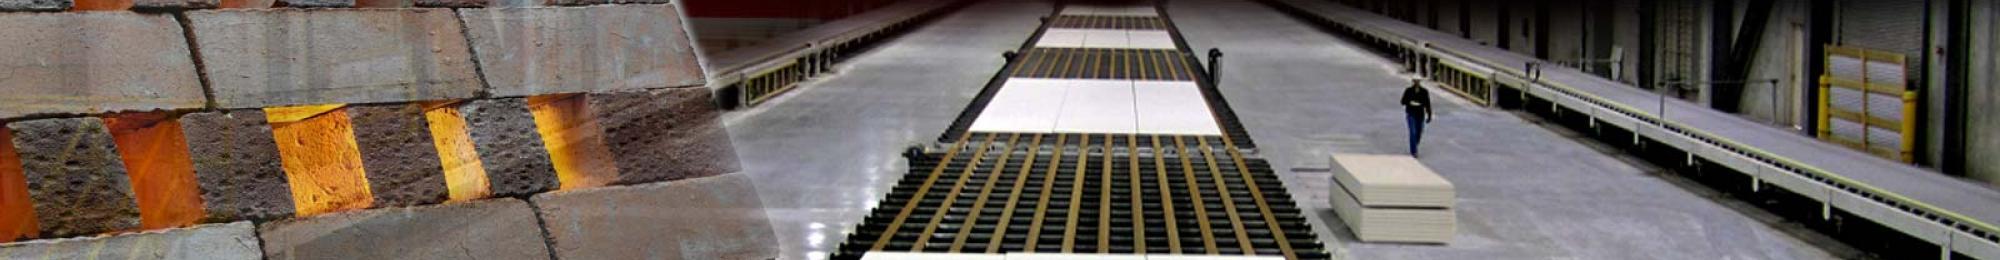 Temperature Monitoring in Construction Materials